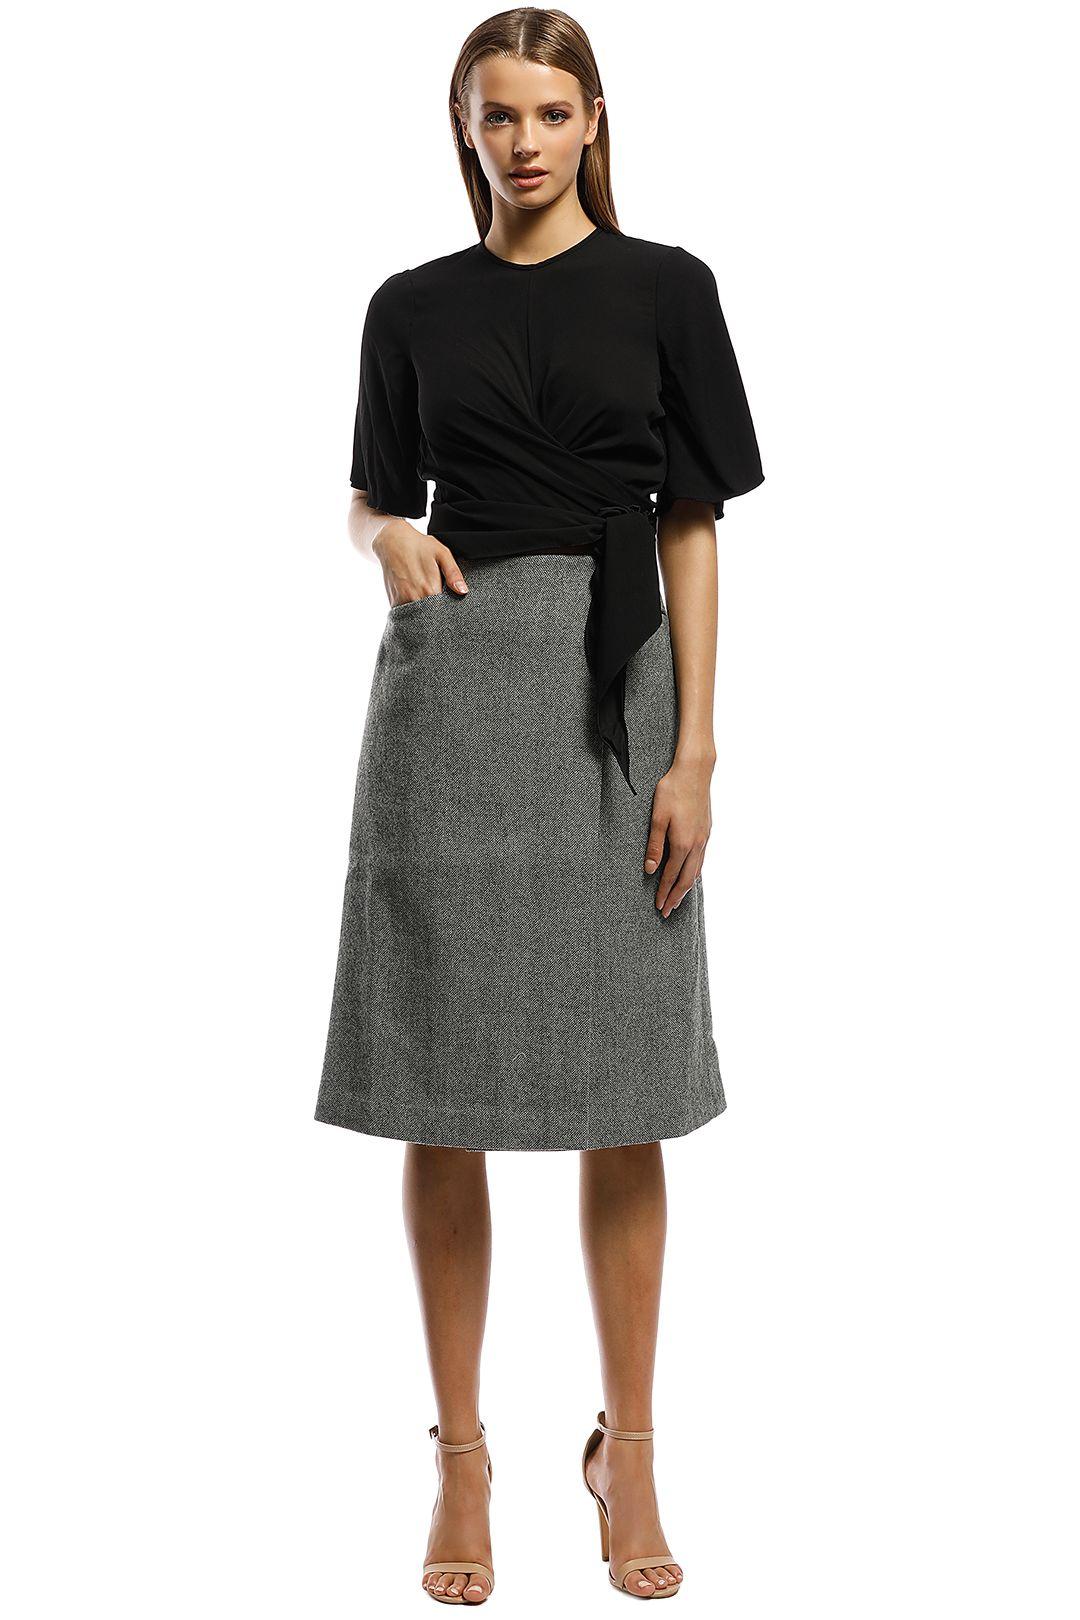 Grace Willow - Gracia Skirt - Grey - Front